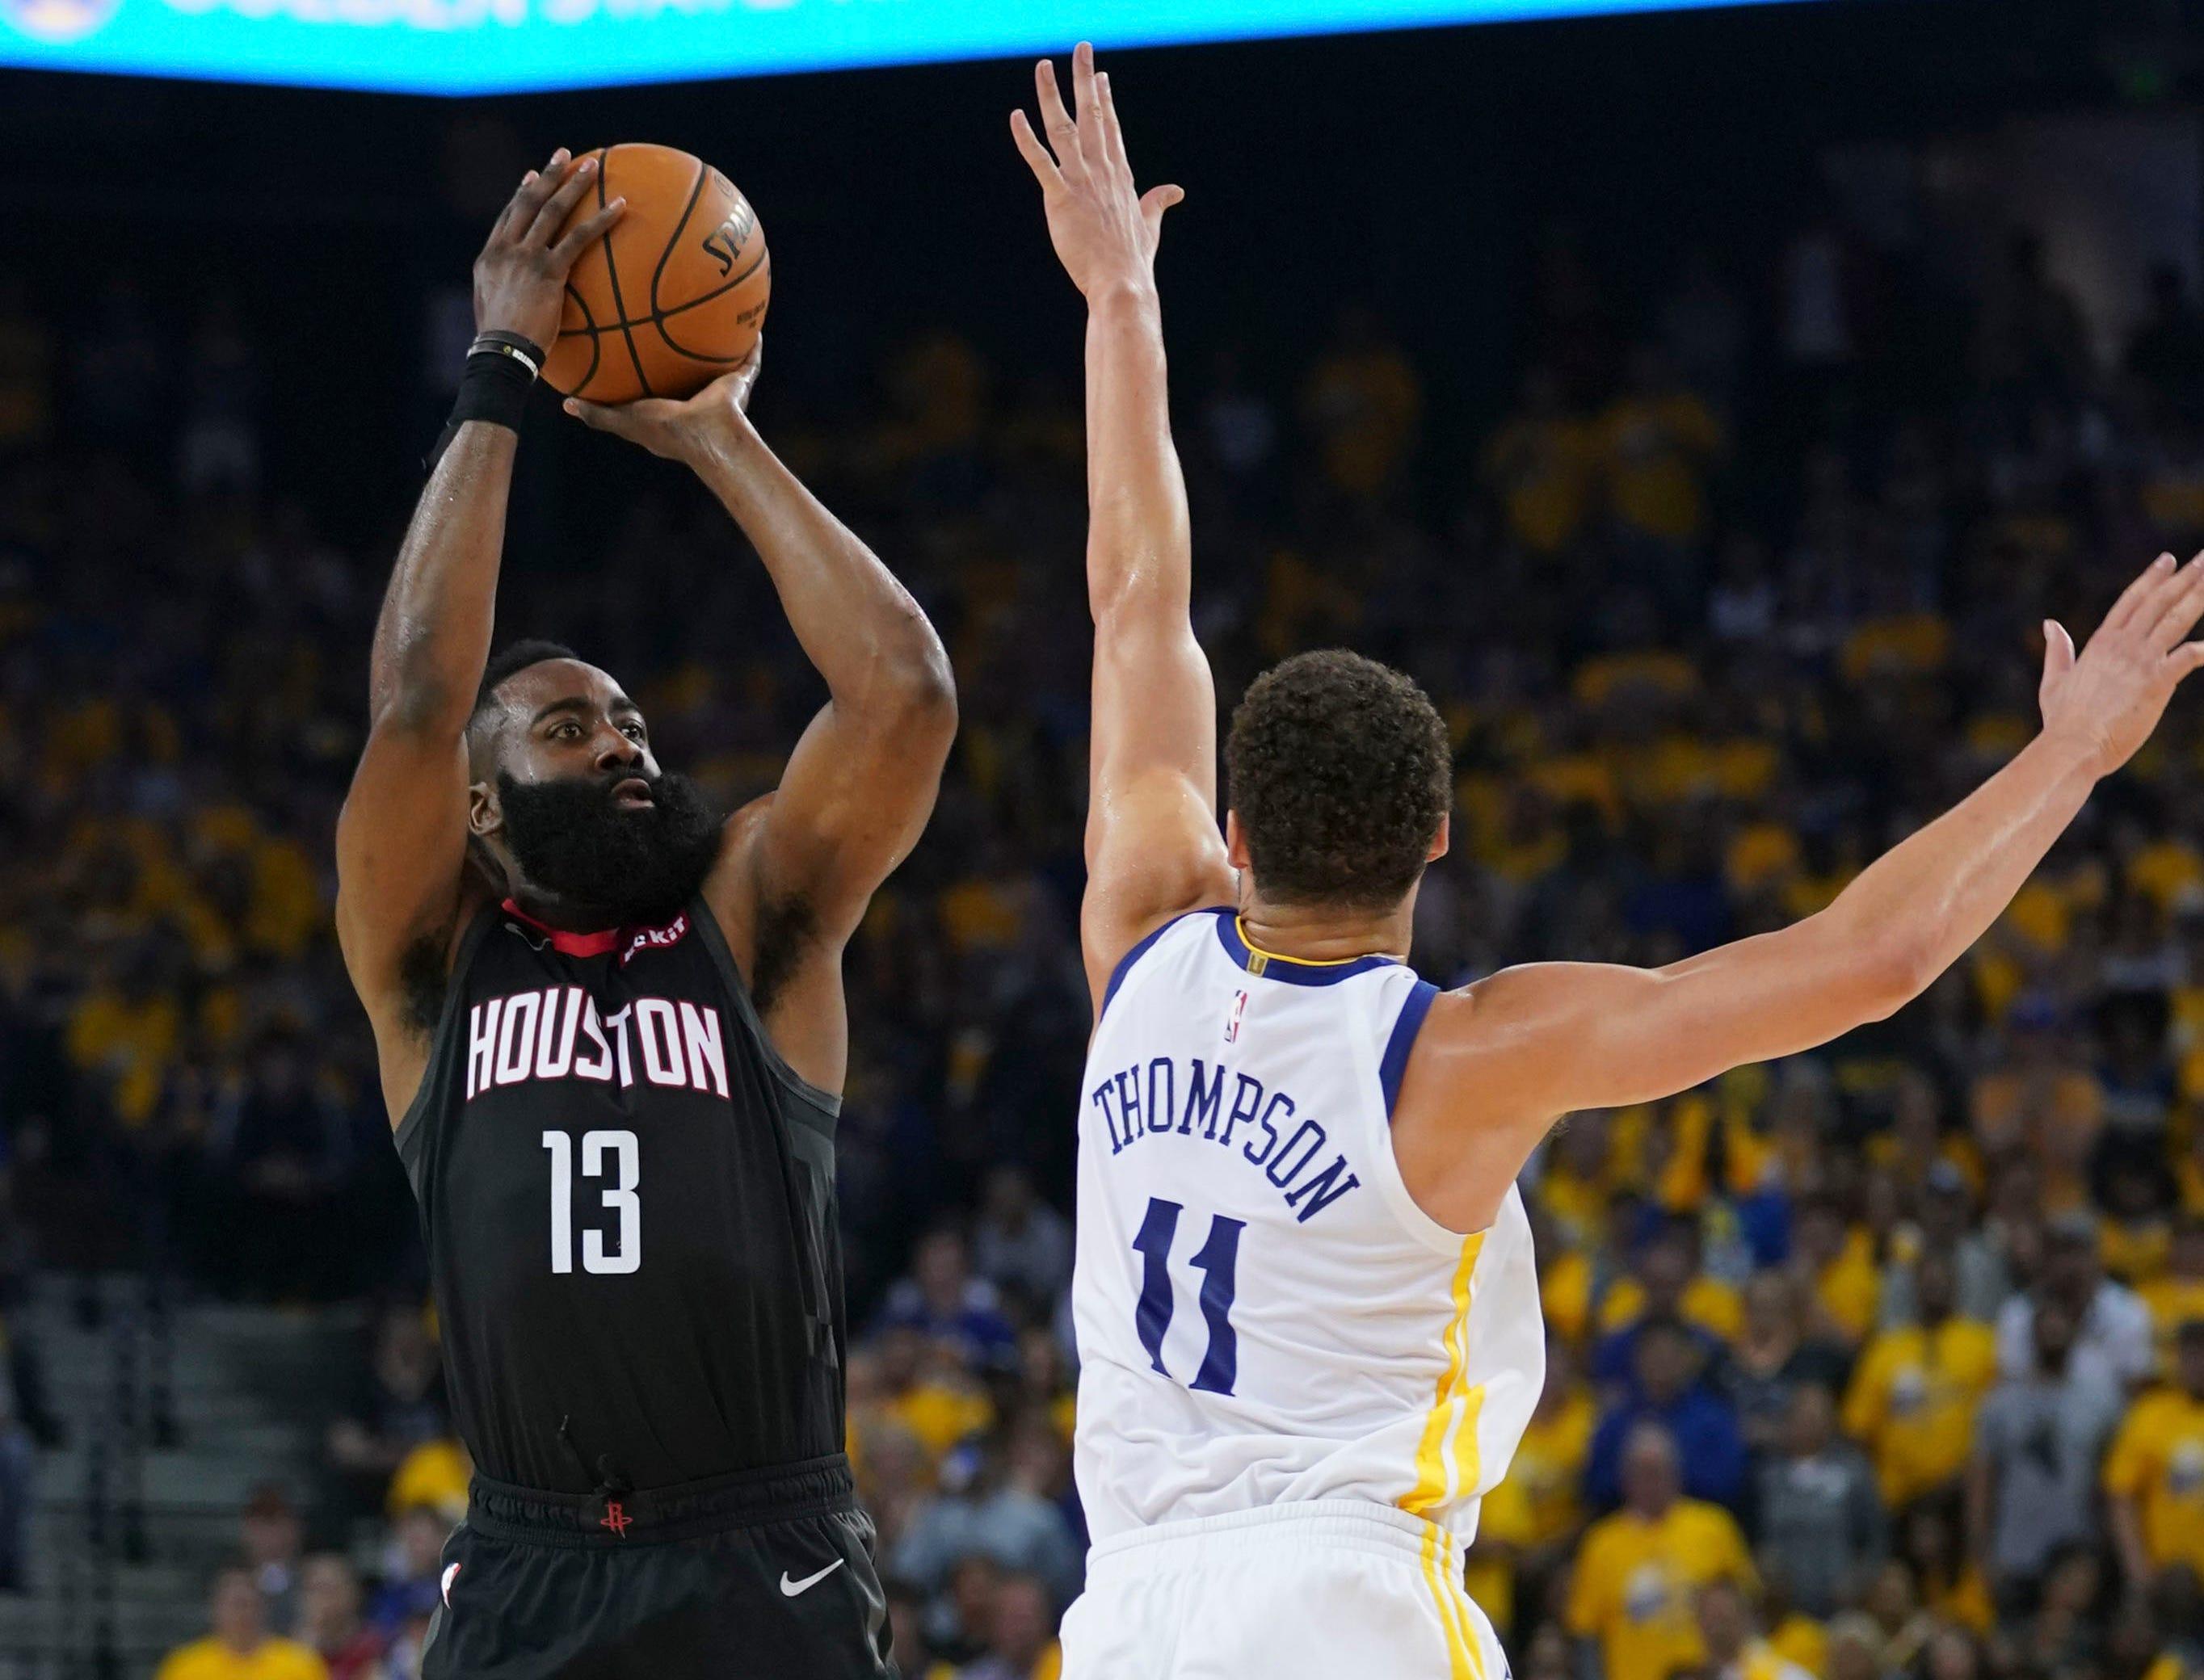 April 28: Rockets guard James Harden (13) shoots over Warriors defender Klay Thompson (11) during Game 1.